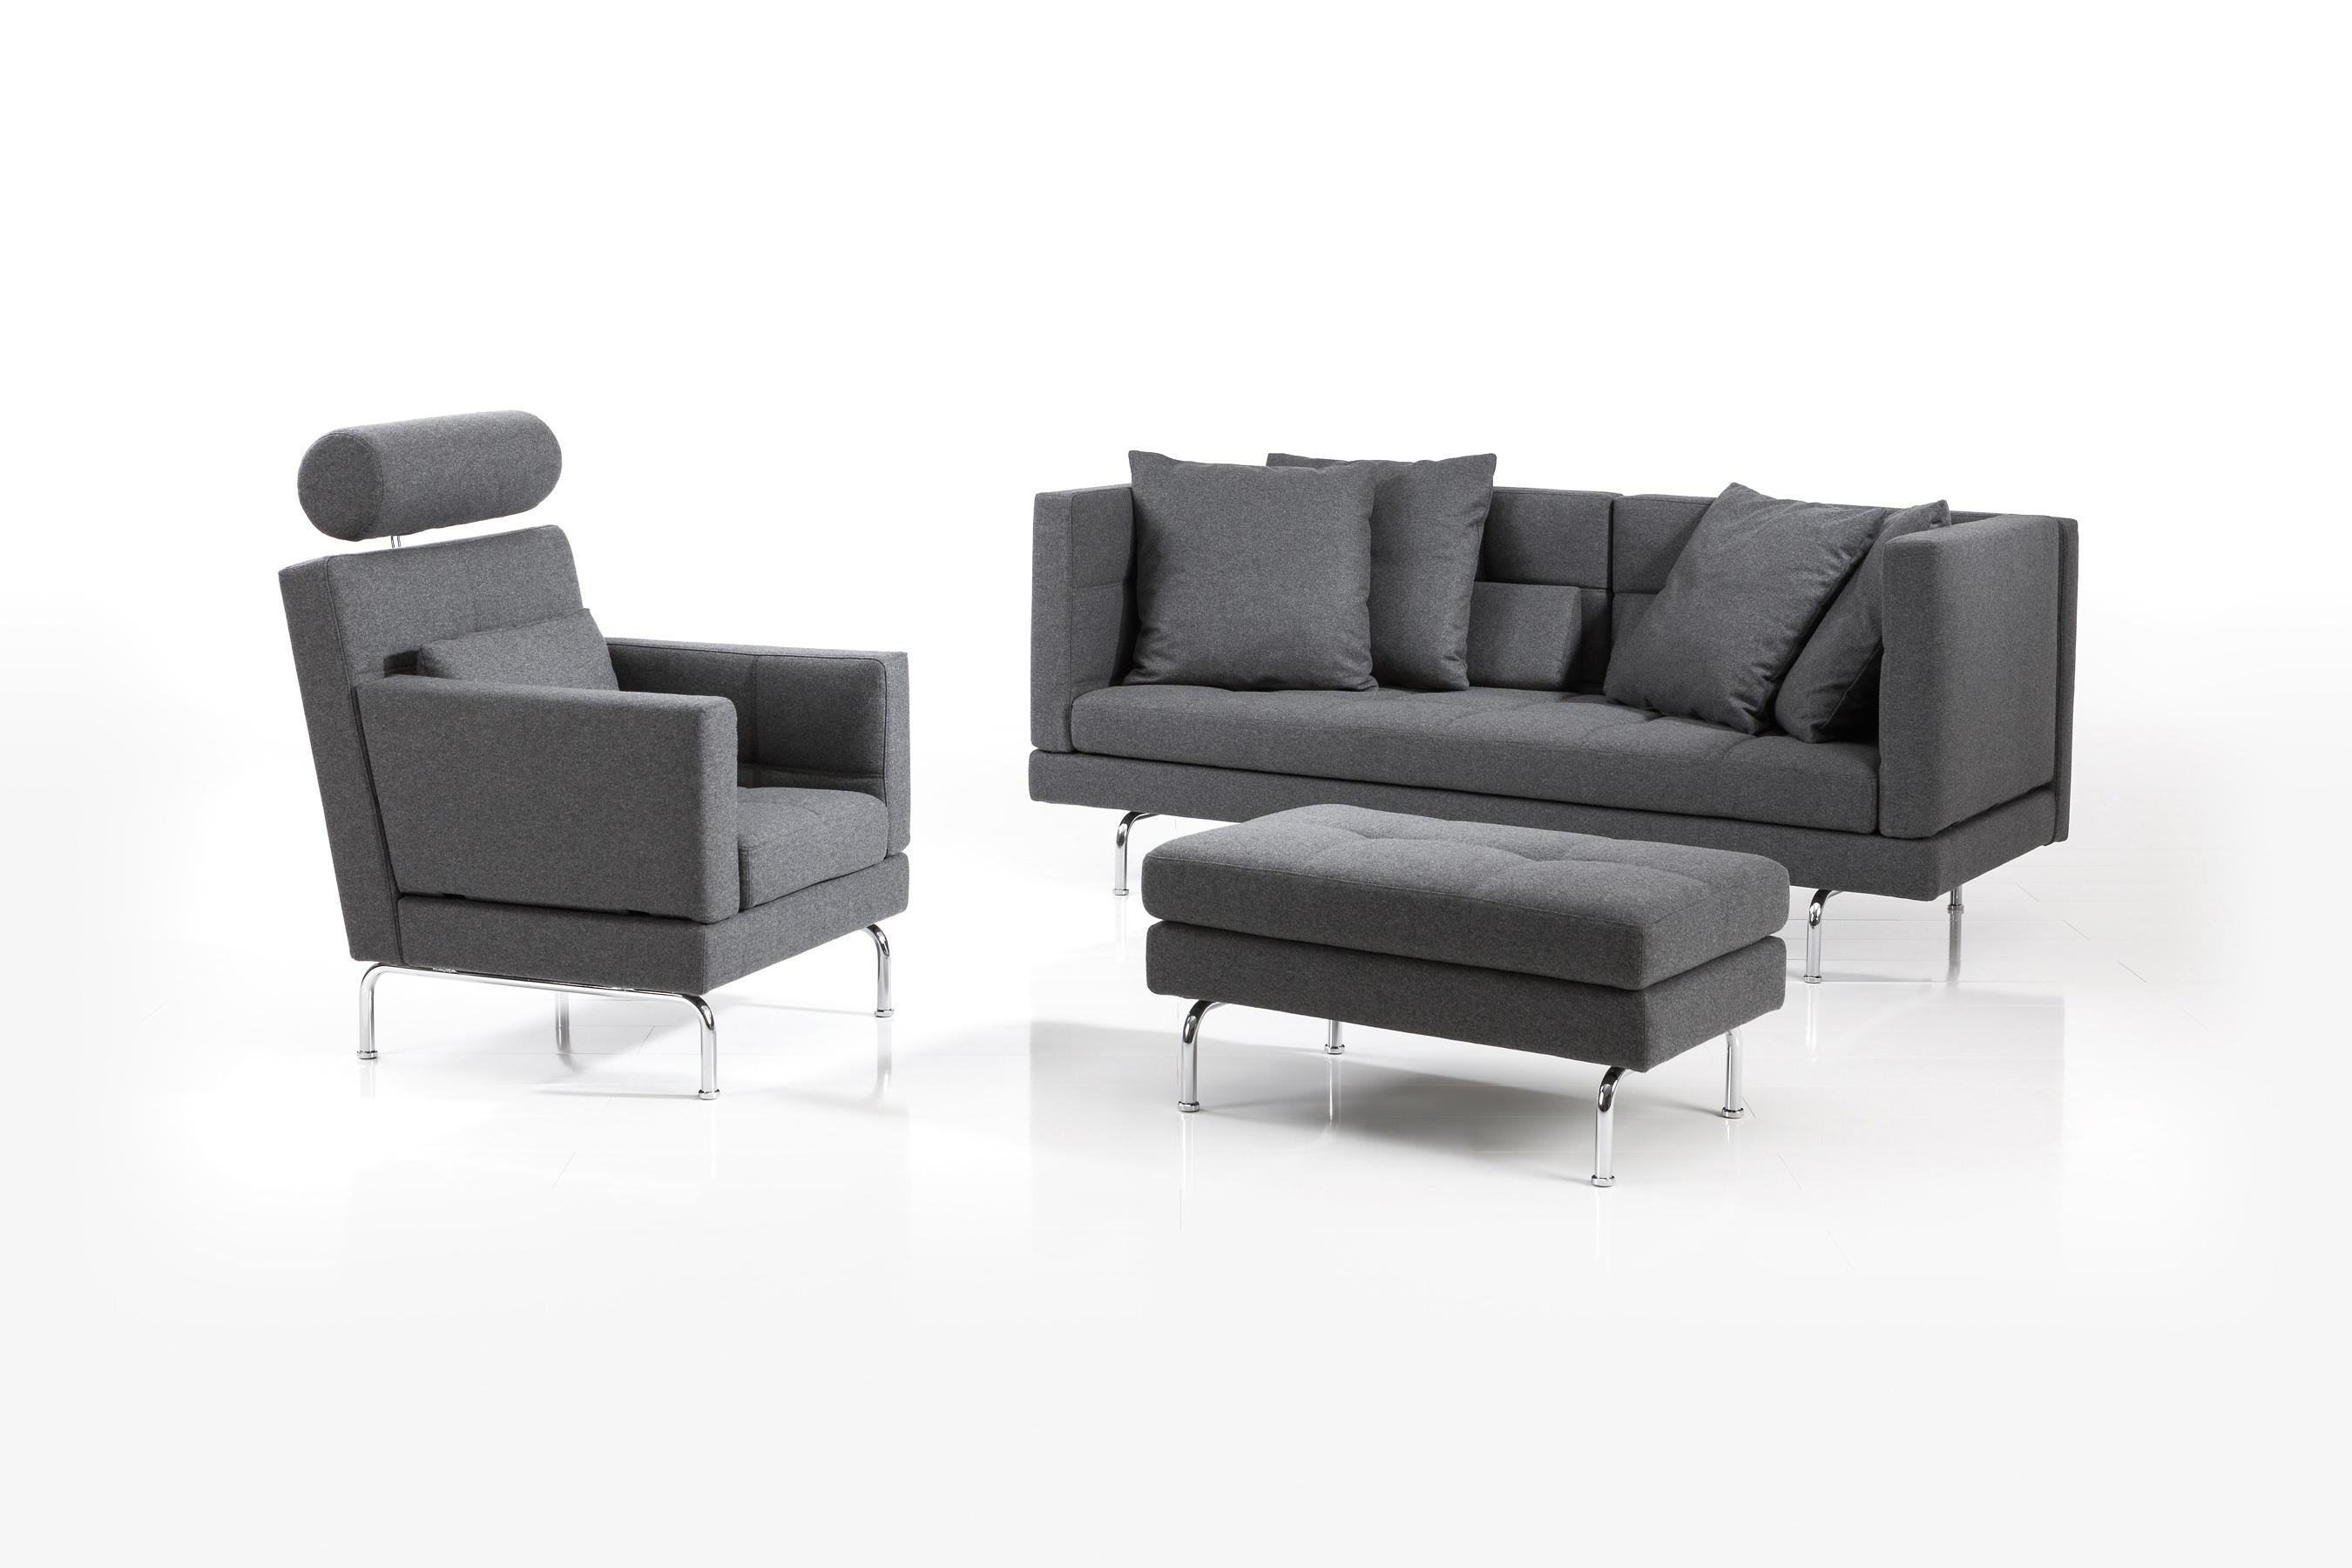 amber sessel loungesessel von br hl architonic. Black Bedroom Furniture Sets. Home Design Ideas